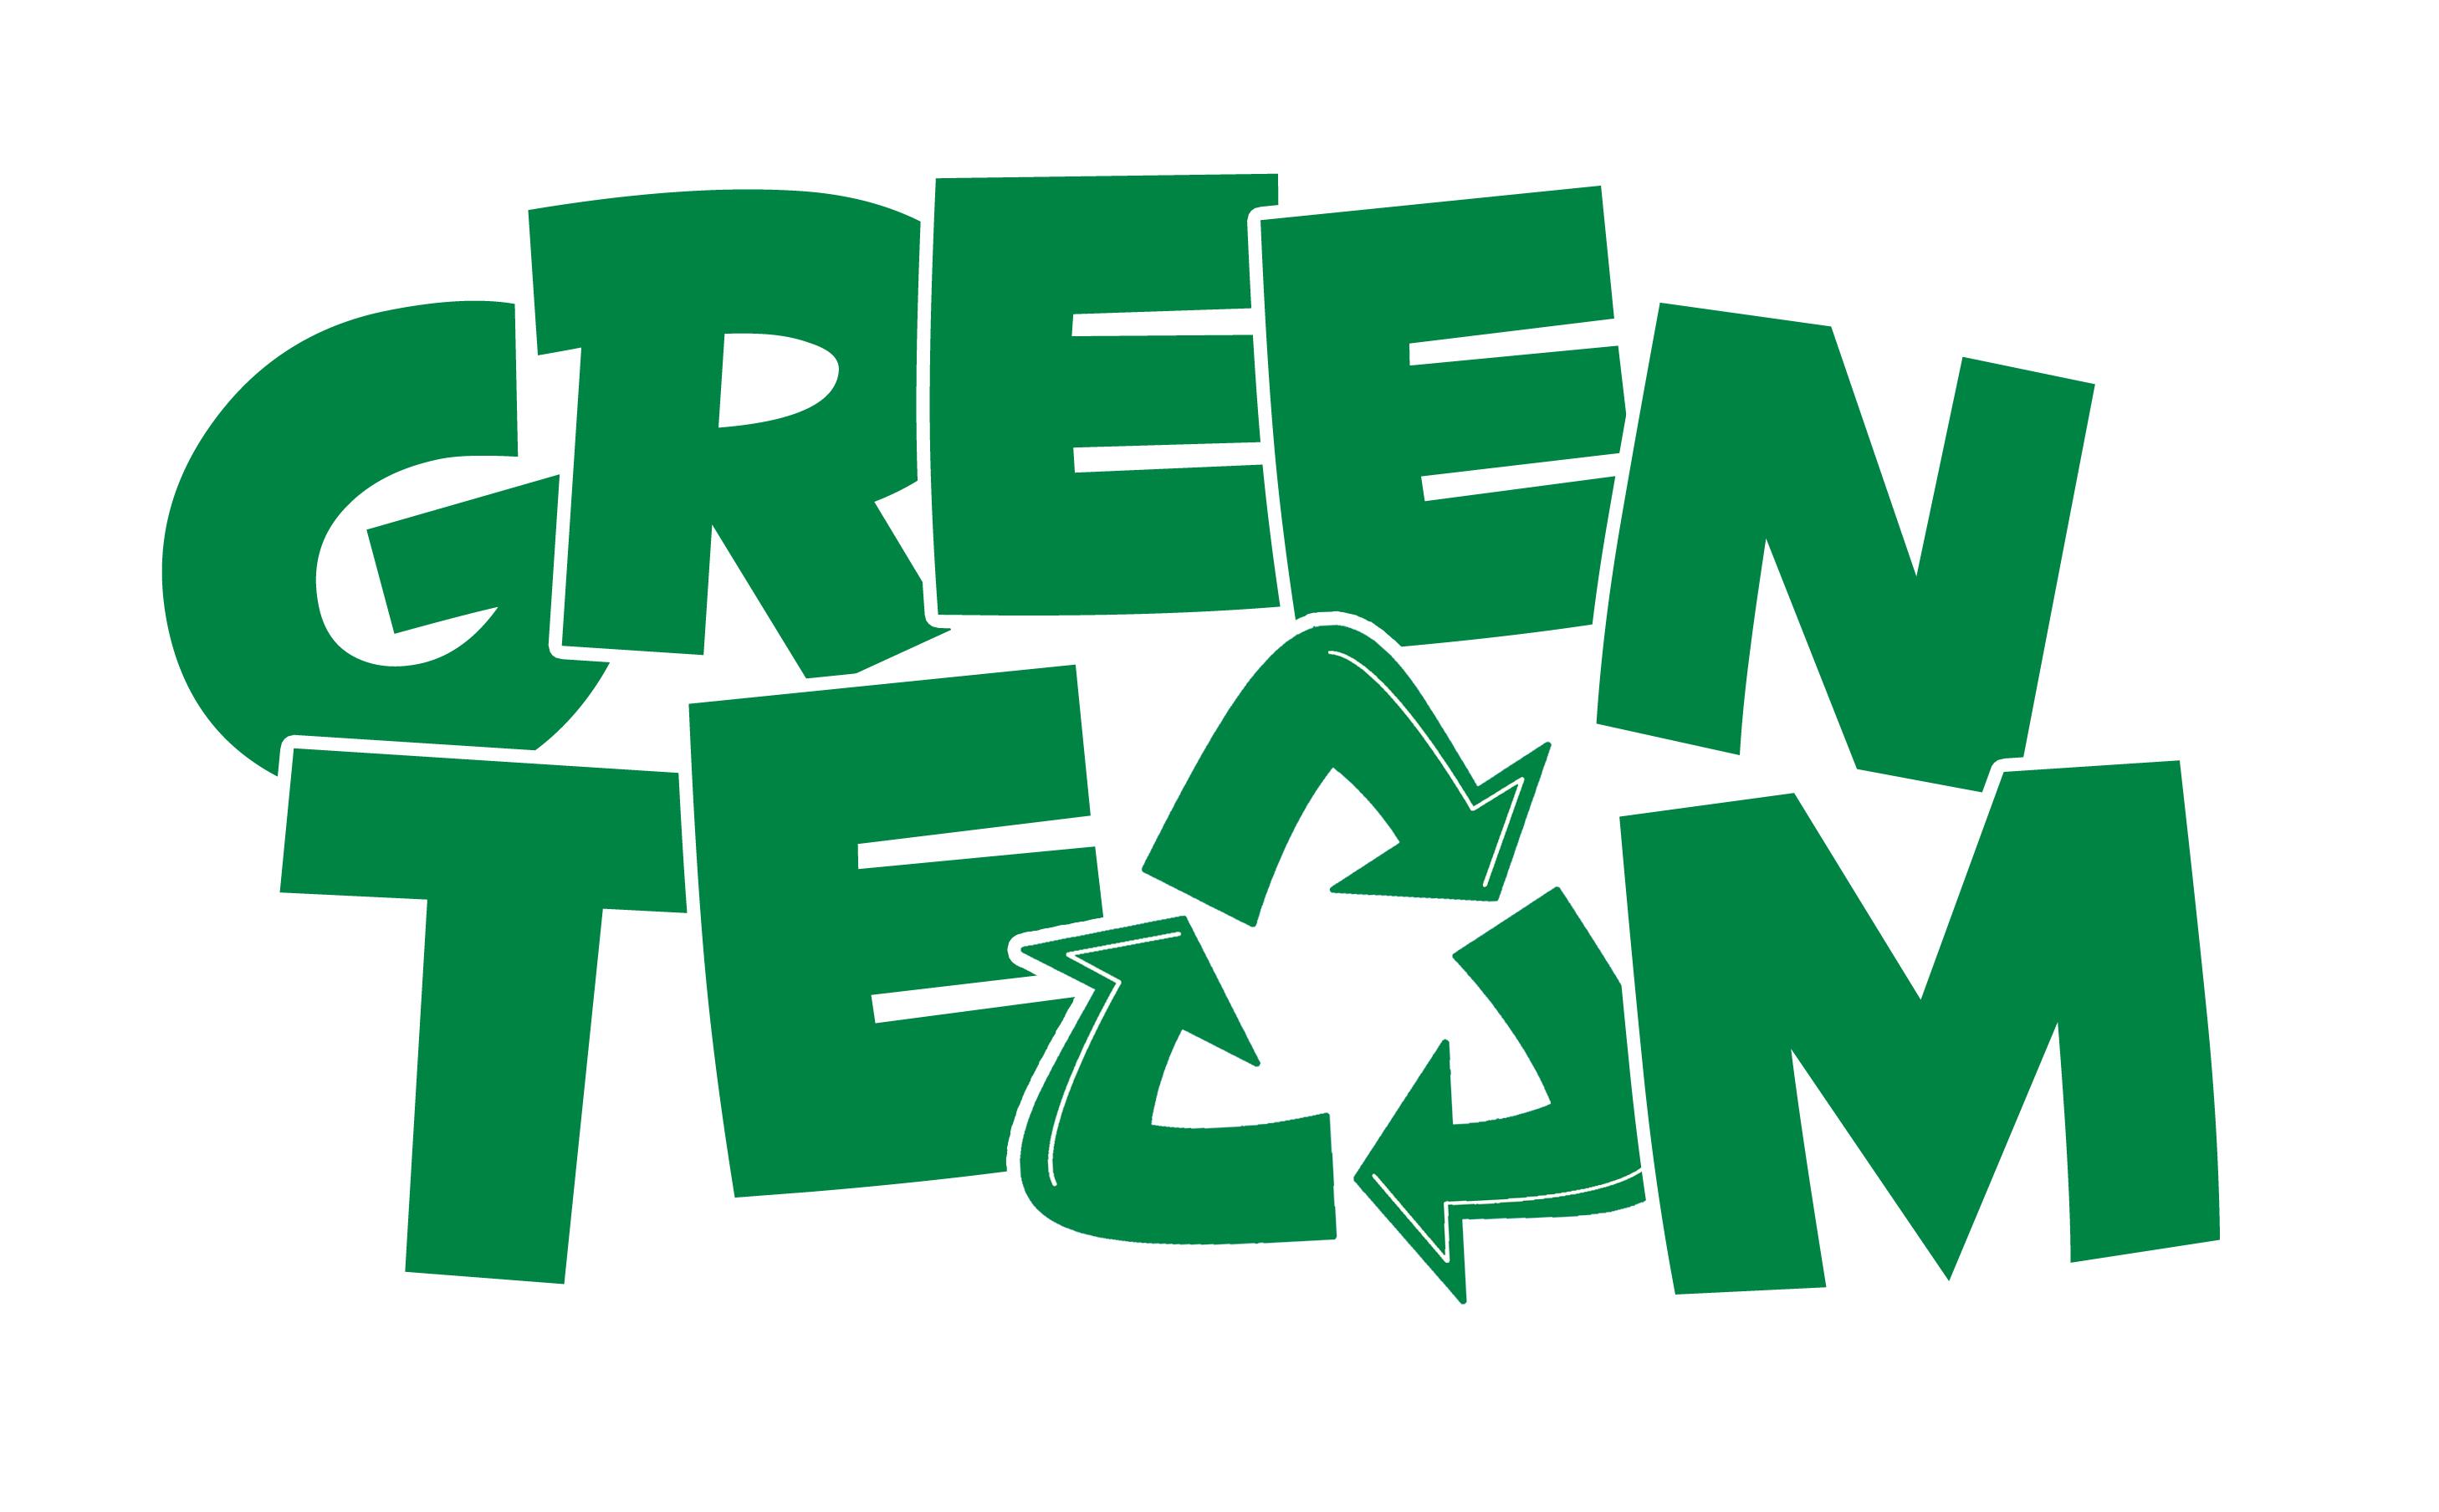 green-team-clipart-9